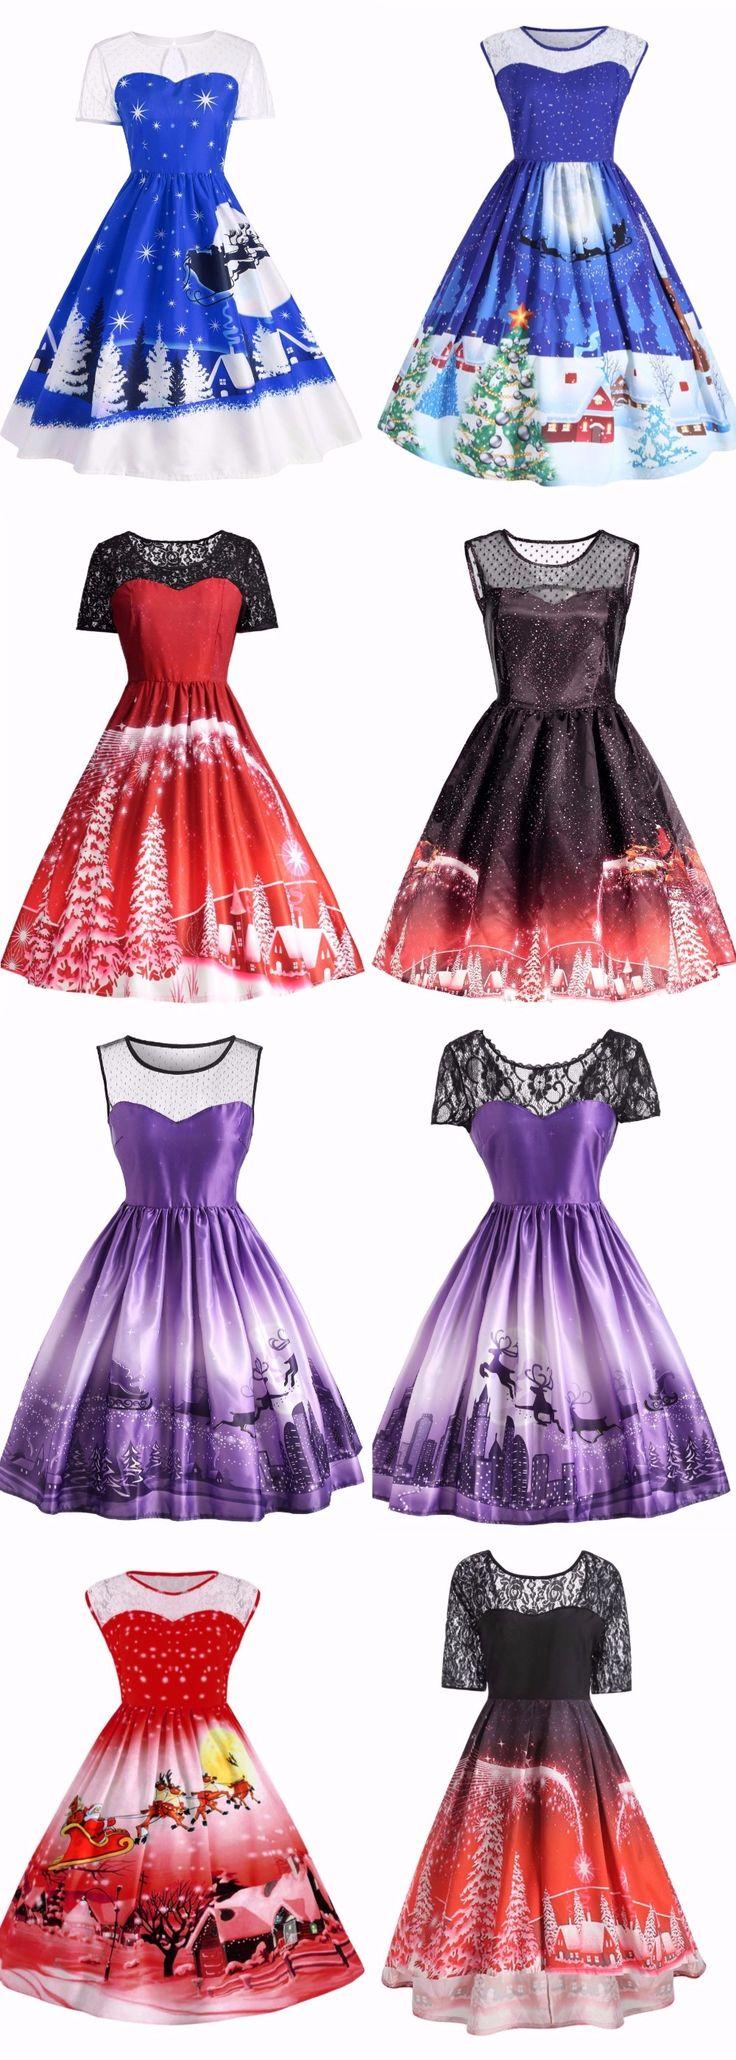 Happy Christmas Dress | Start From Only $14 | Plus Size |  Dress Frill | Dress Geometric | Feather Dress | Chiffon Ruched | Mermaid Dress | Ruffle Dress | Purple Dress | Belted Surplice | Sammydress.com